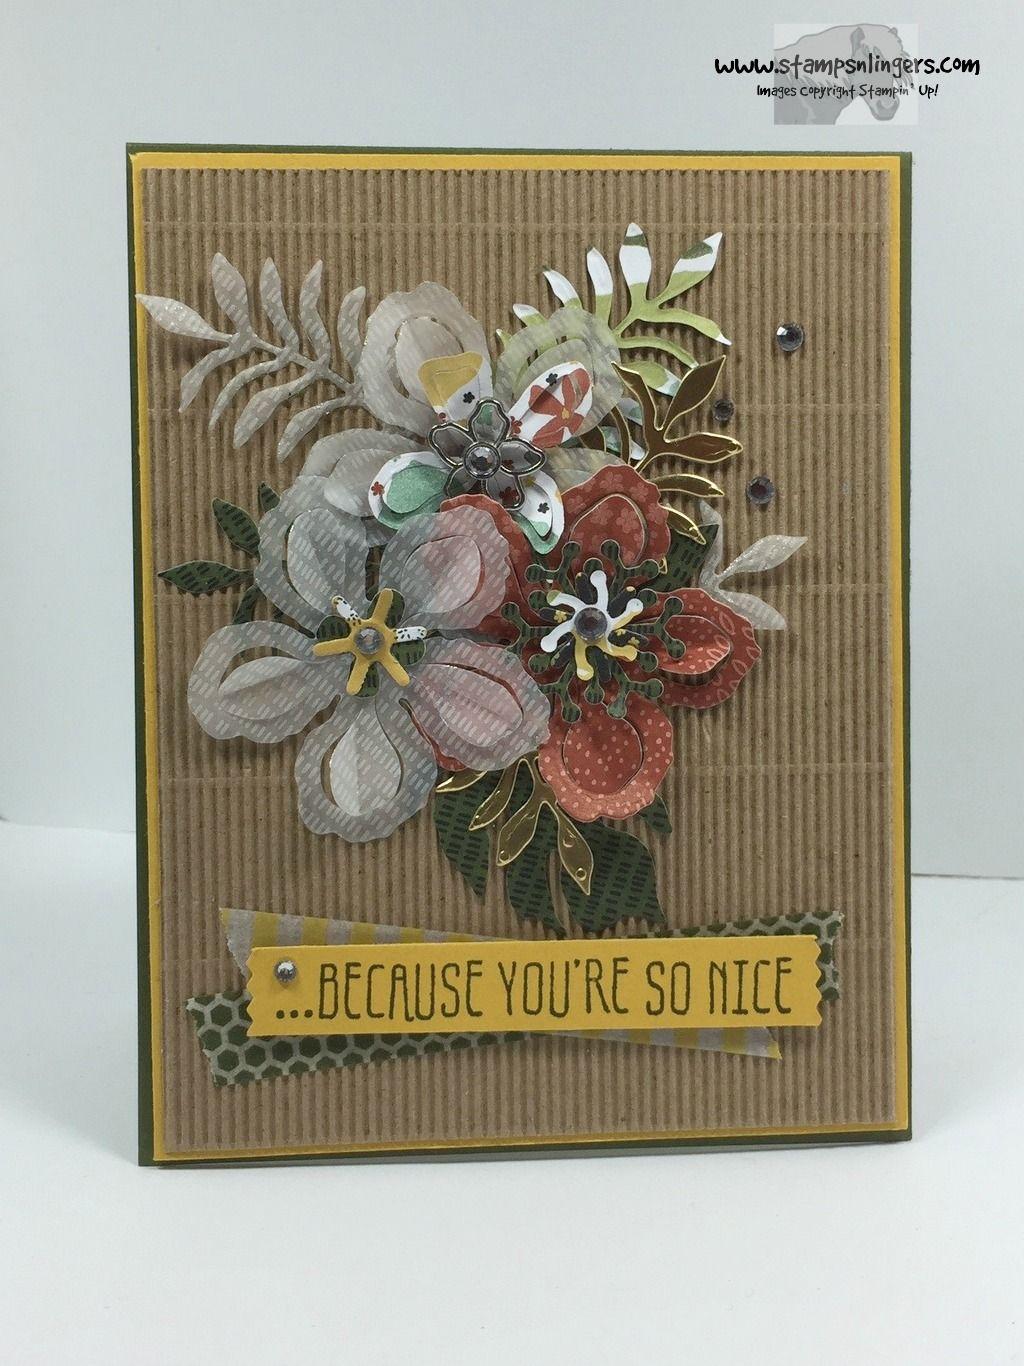 Stampin' Up - Botanical Builder For You - Stamps-N-Lingers